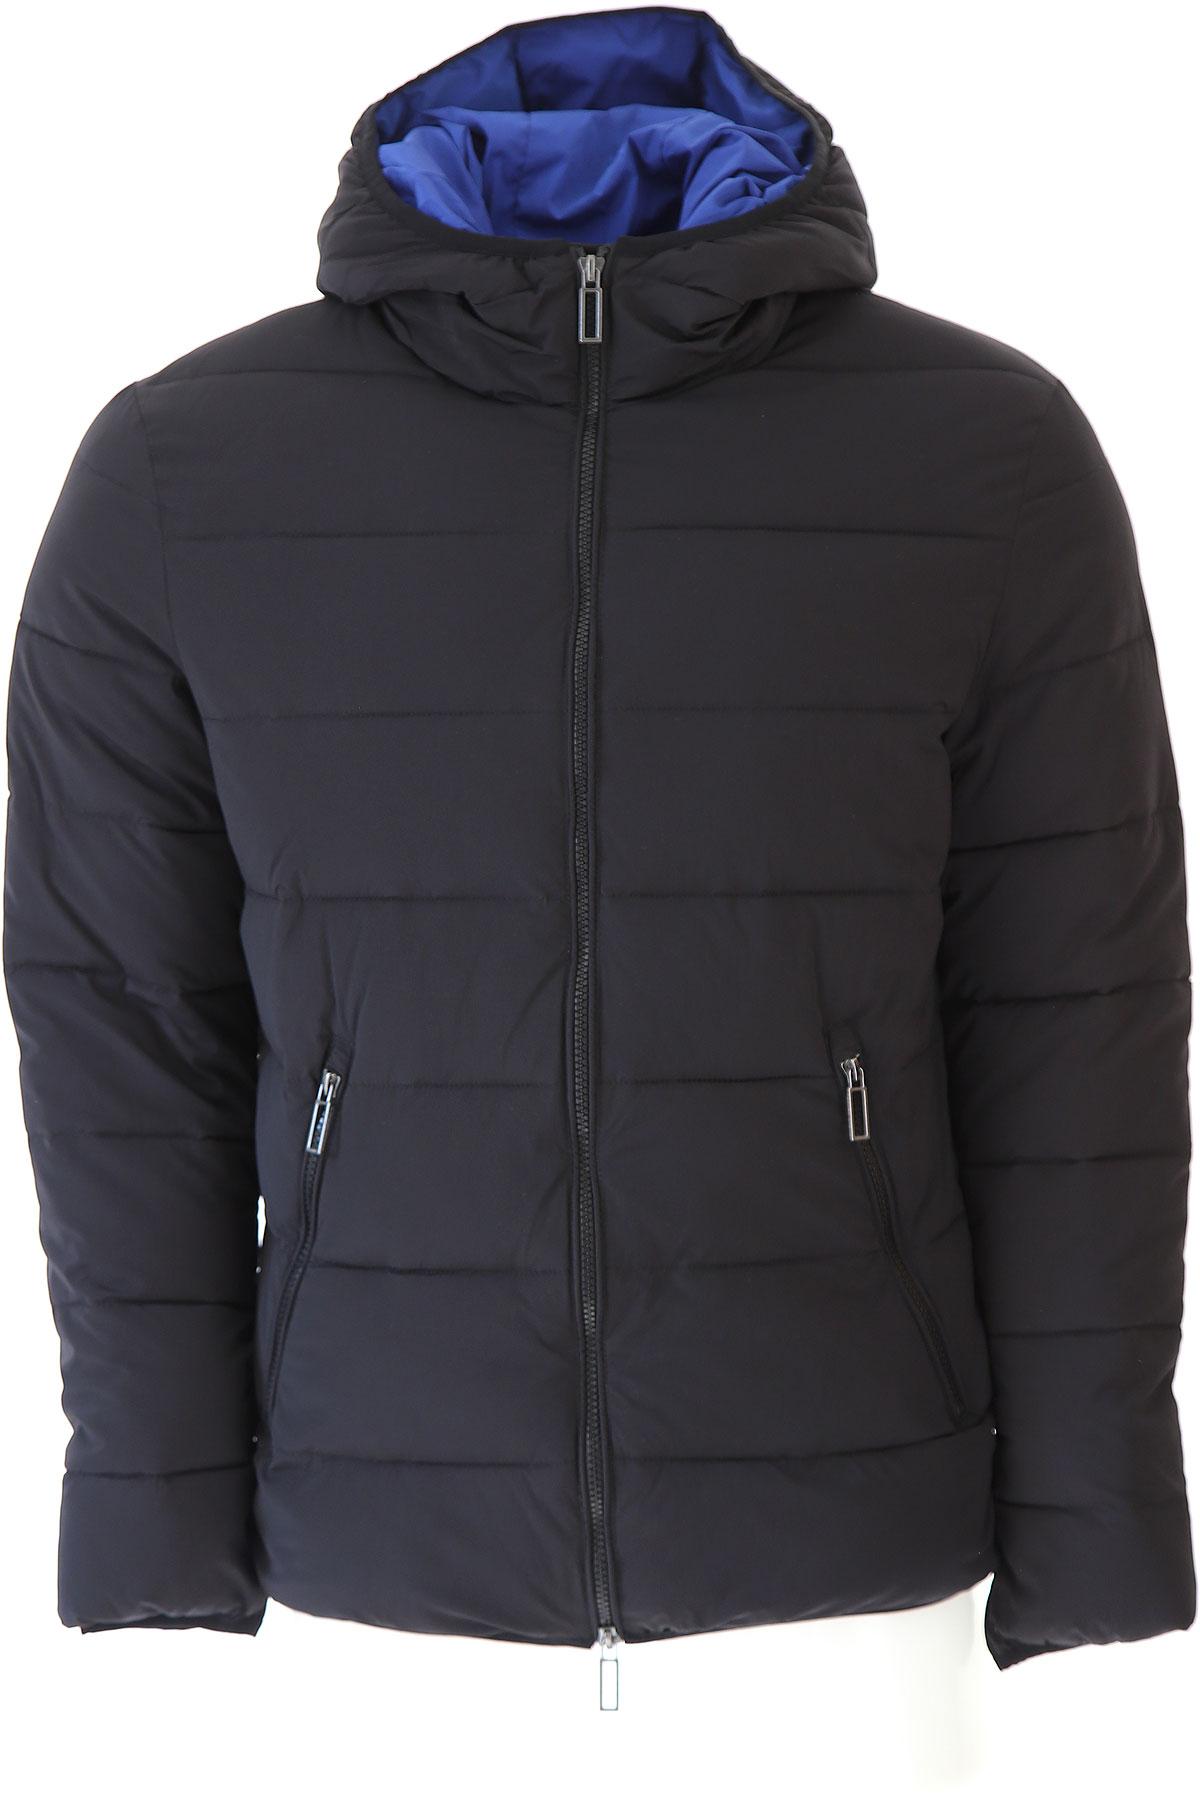 Image of Paolo Pecora Down Jacket for Men, Puffer Ski Jacket, Black, polyamide, 2017, L M S XL